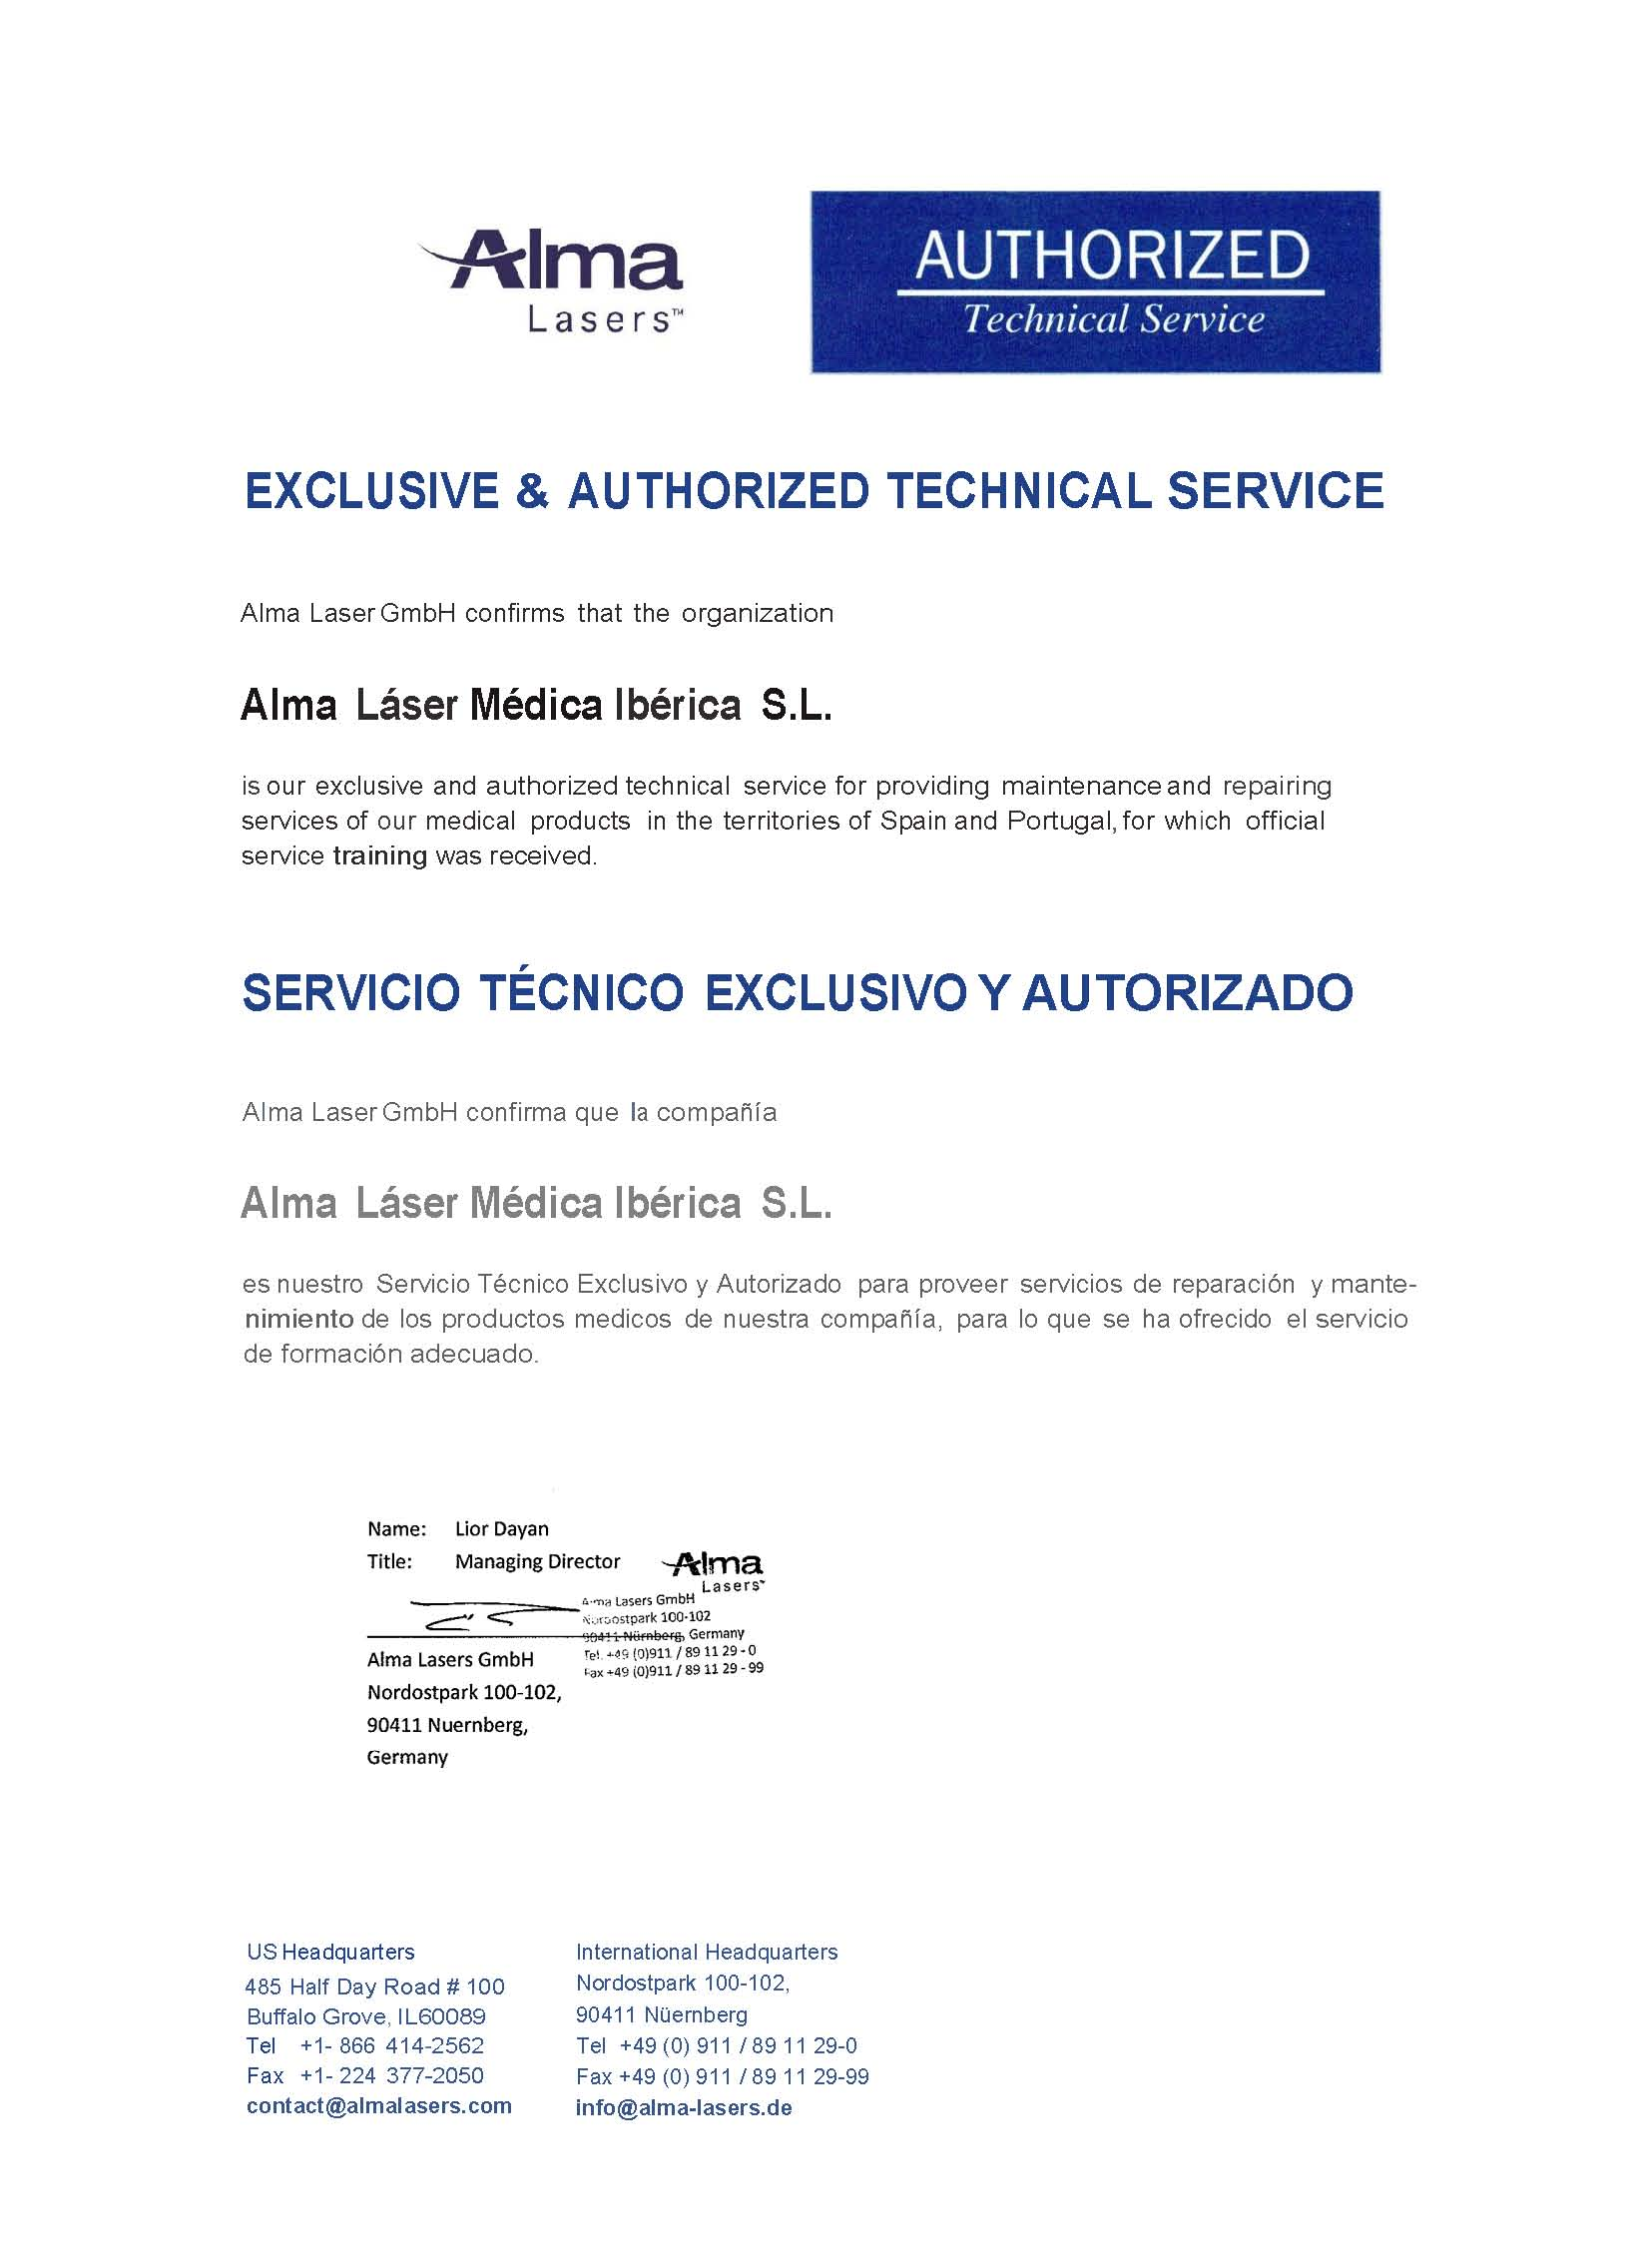 Soporte a clientes de Alma Lasers Médica